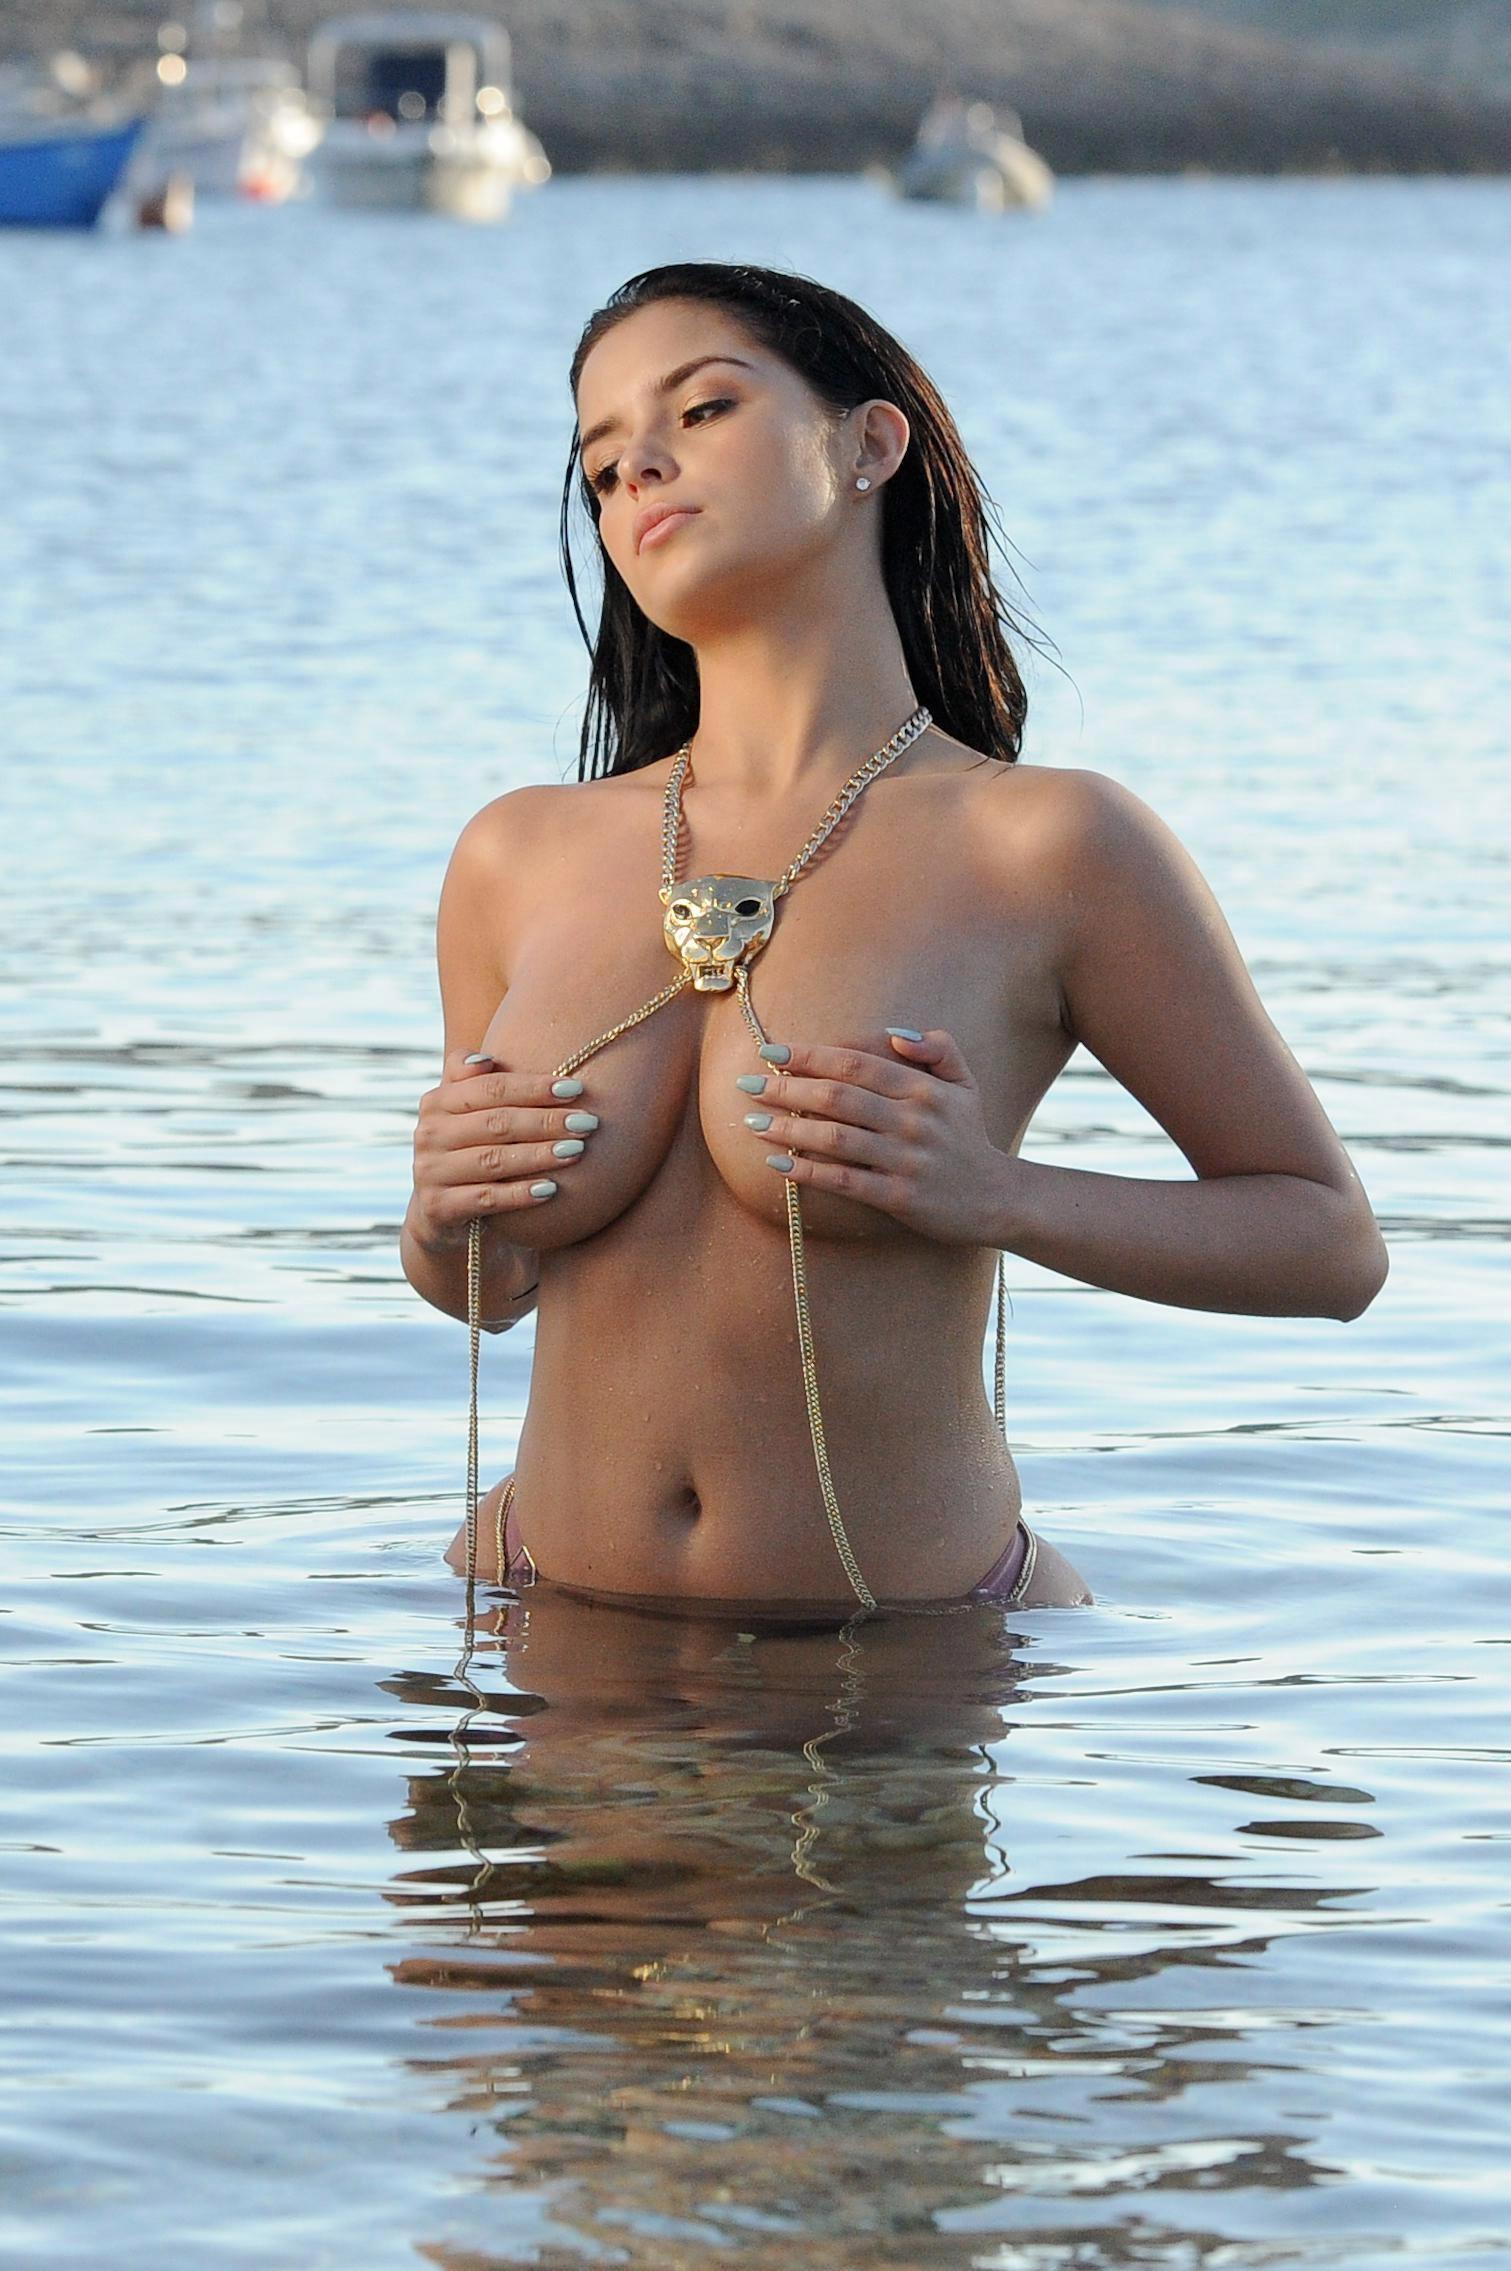 https://img7.hotnessrater.com/4510382/demi-rose-mawby-topless.jpg?w=4000&h=6000